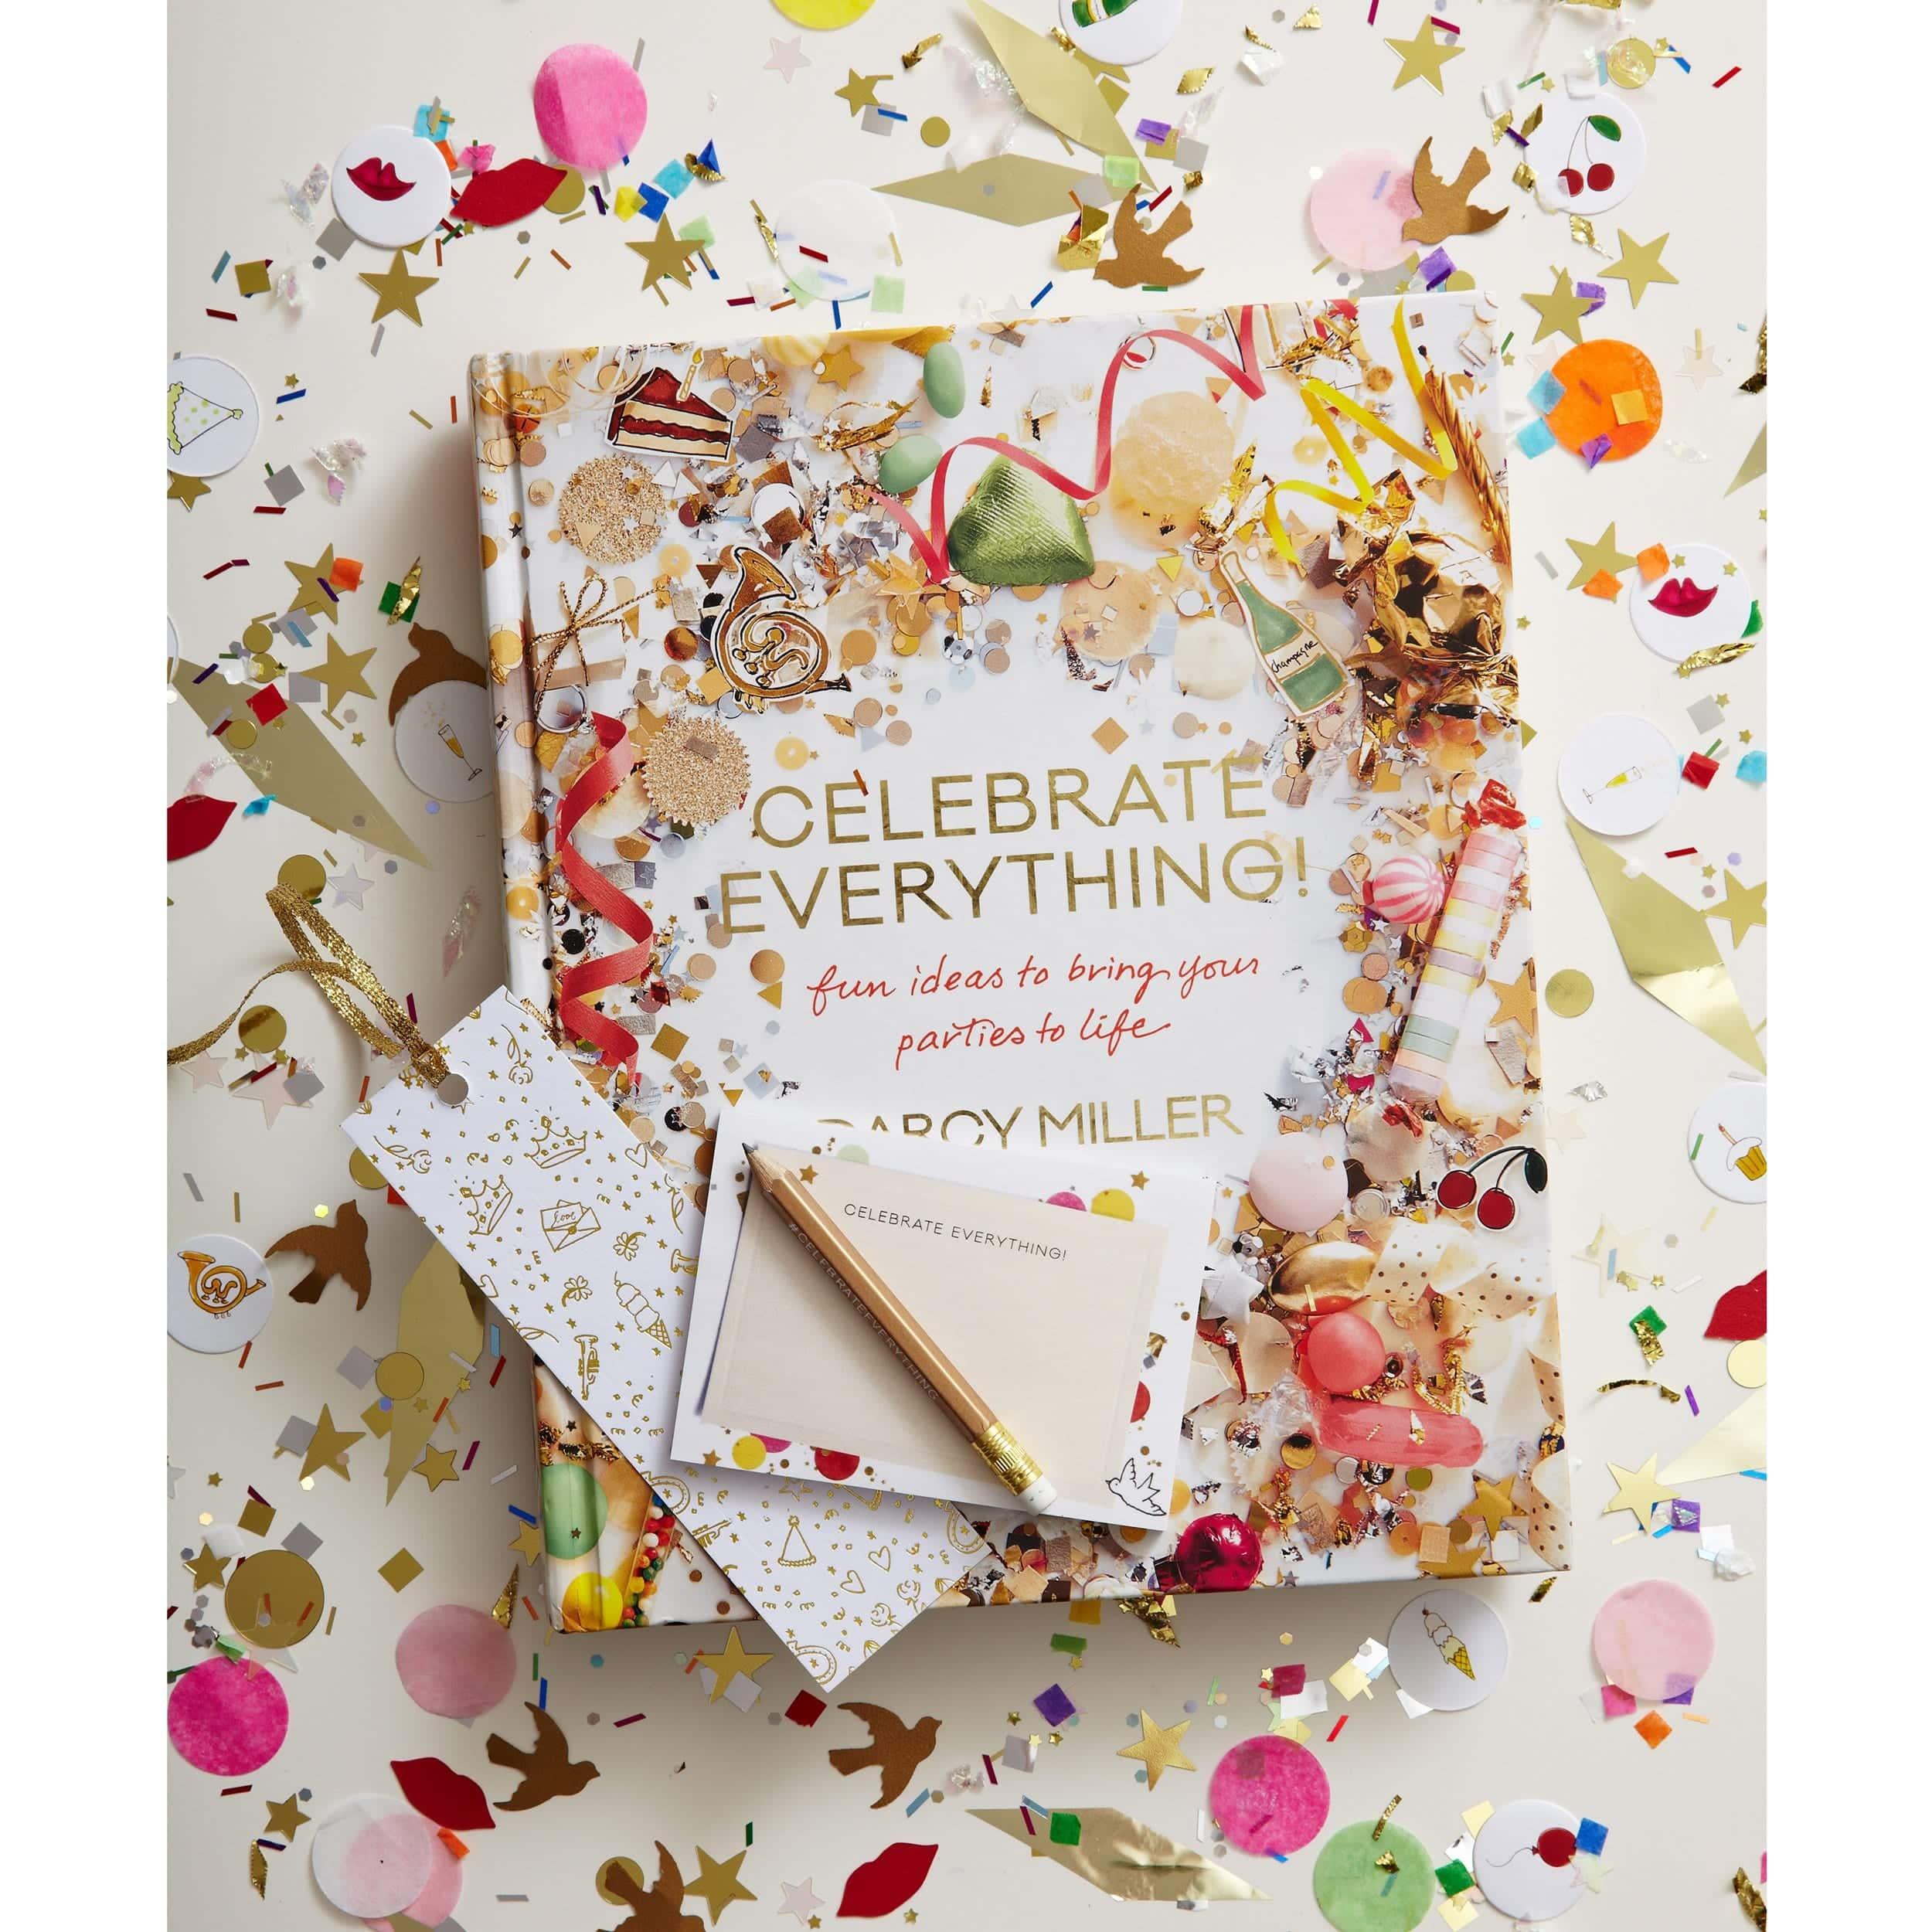 darcy-miller_celebrate-everything_02